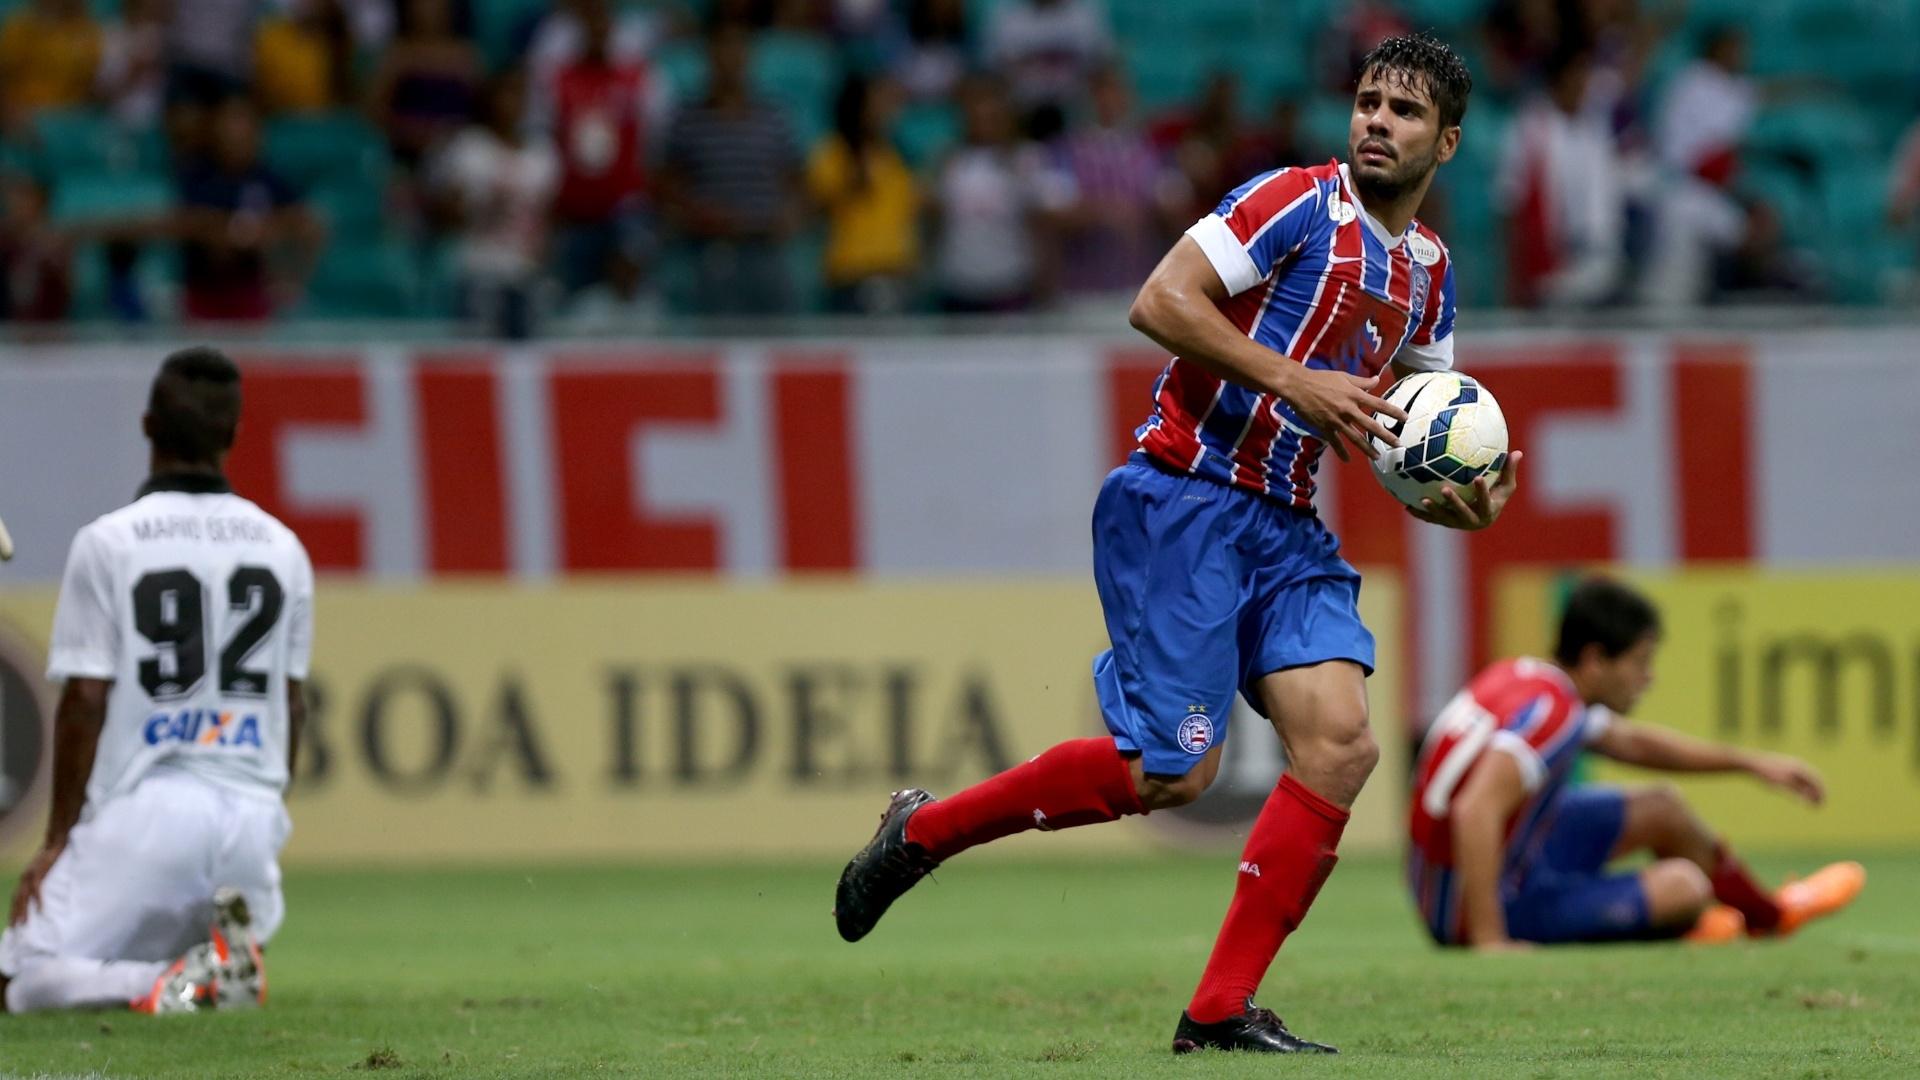 Henrique fez o primeiro gol do Bahia na partida